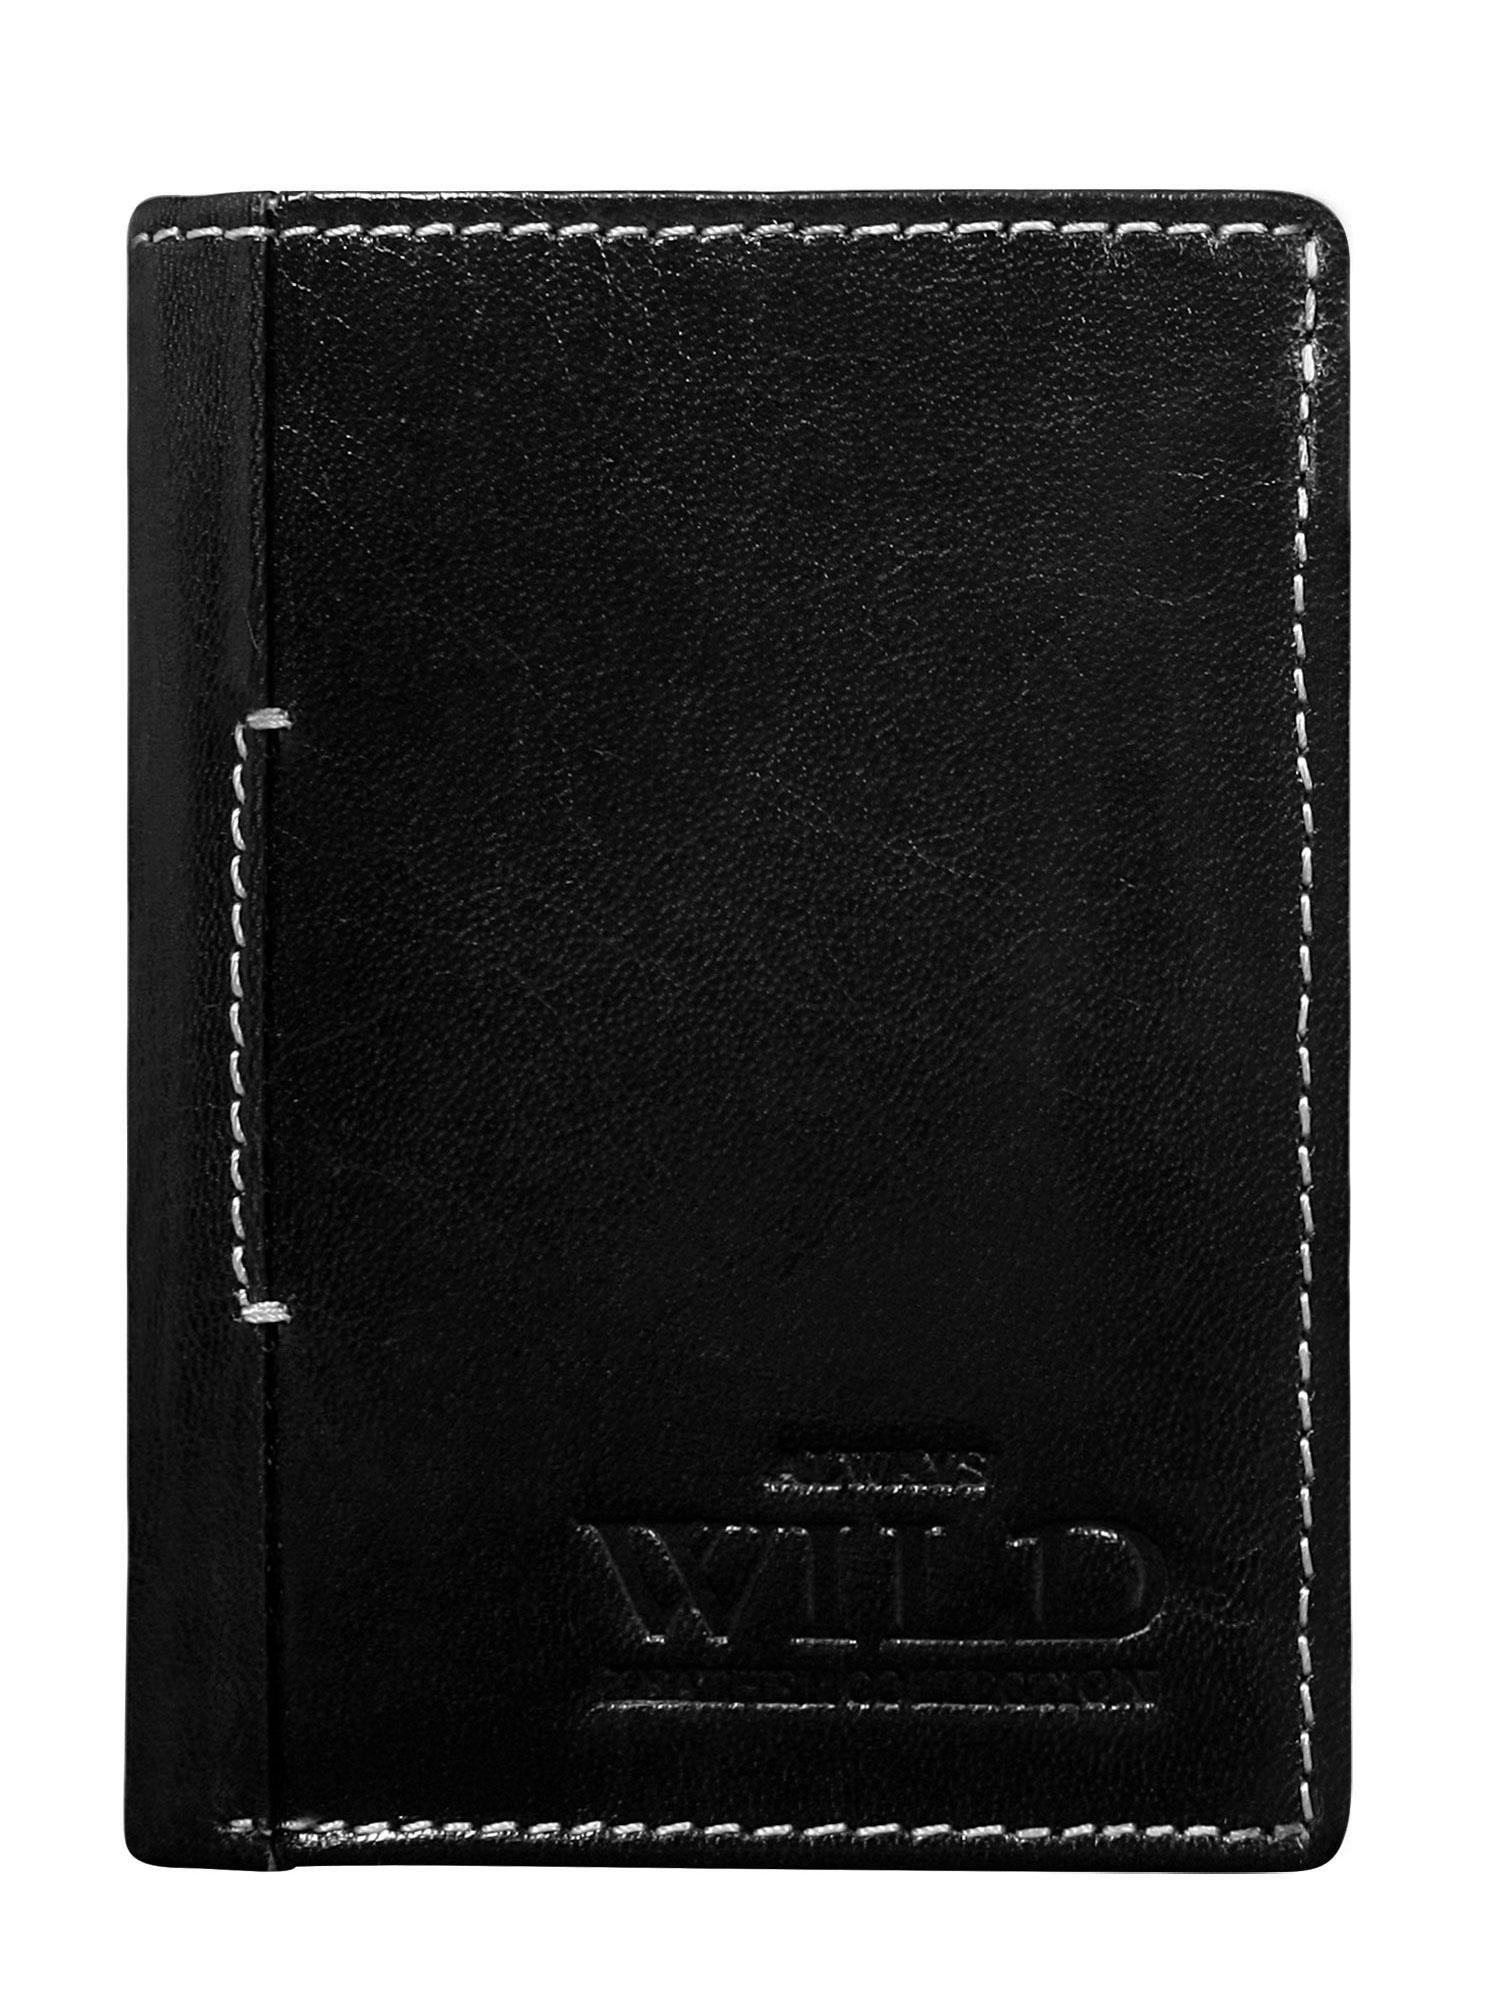 Pánska malá čierna kožená peňaženka univerzální